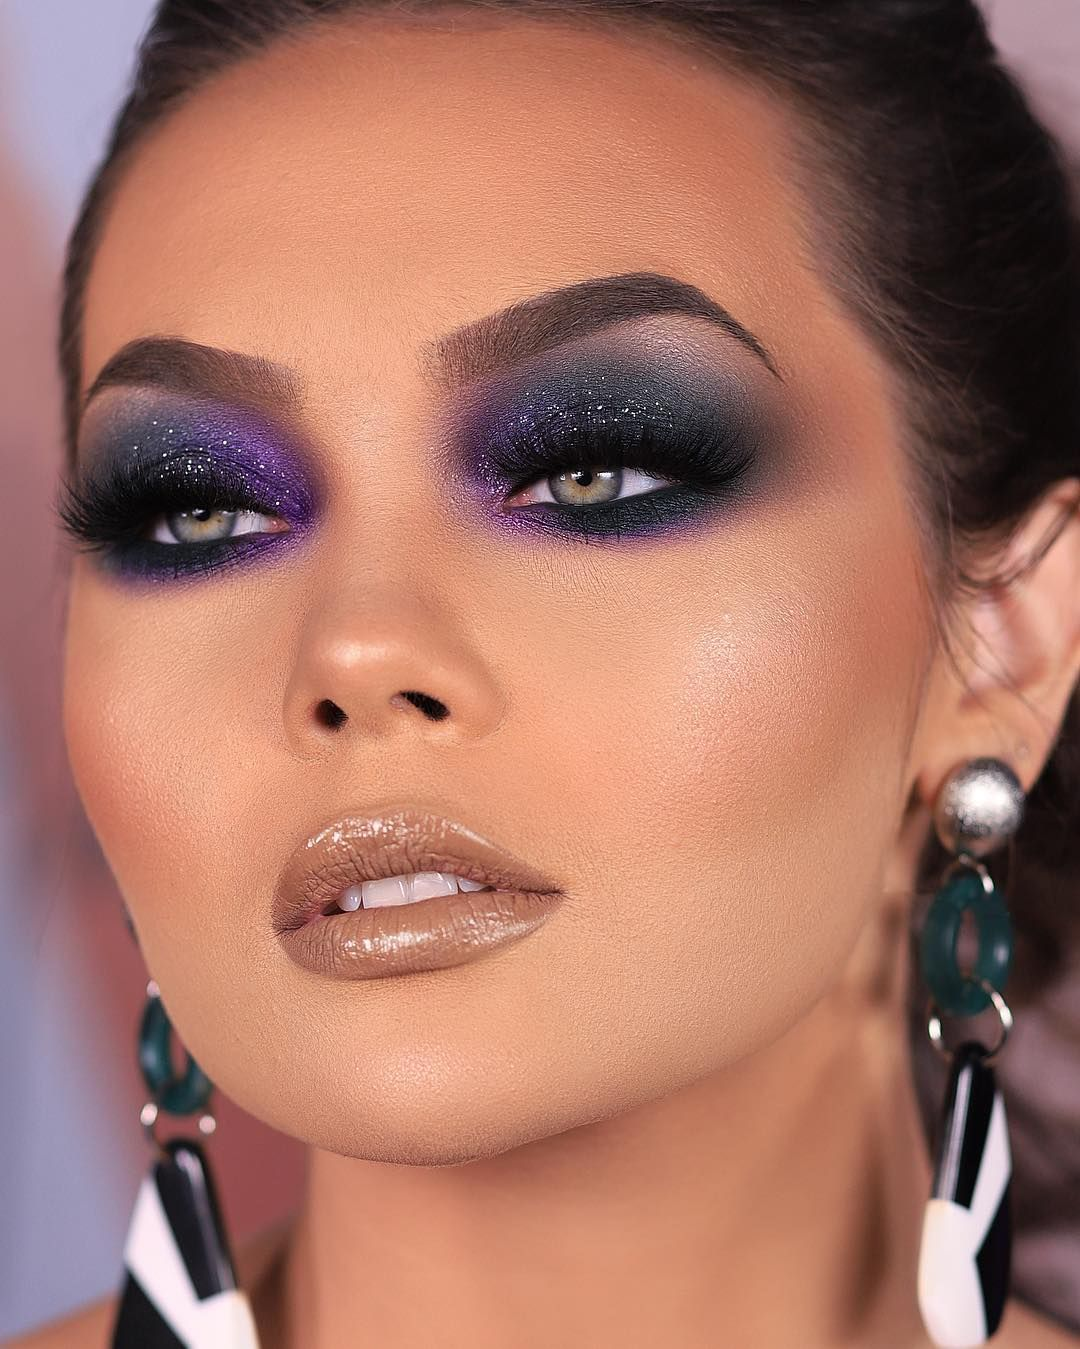 Her eye color 😍 in 2020 Intense eye makeup, Makeup, Blue